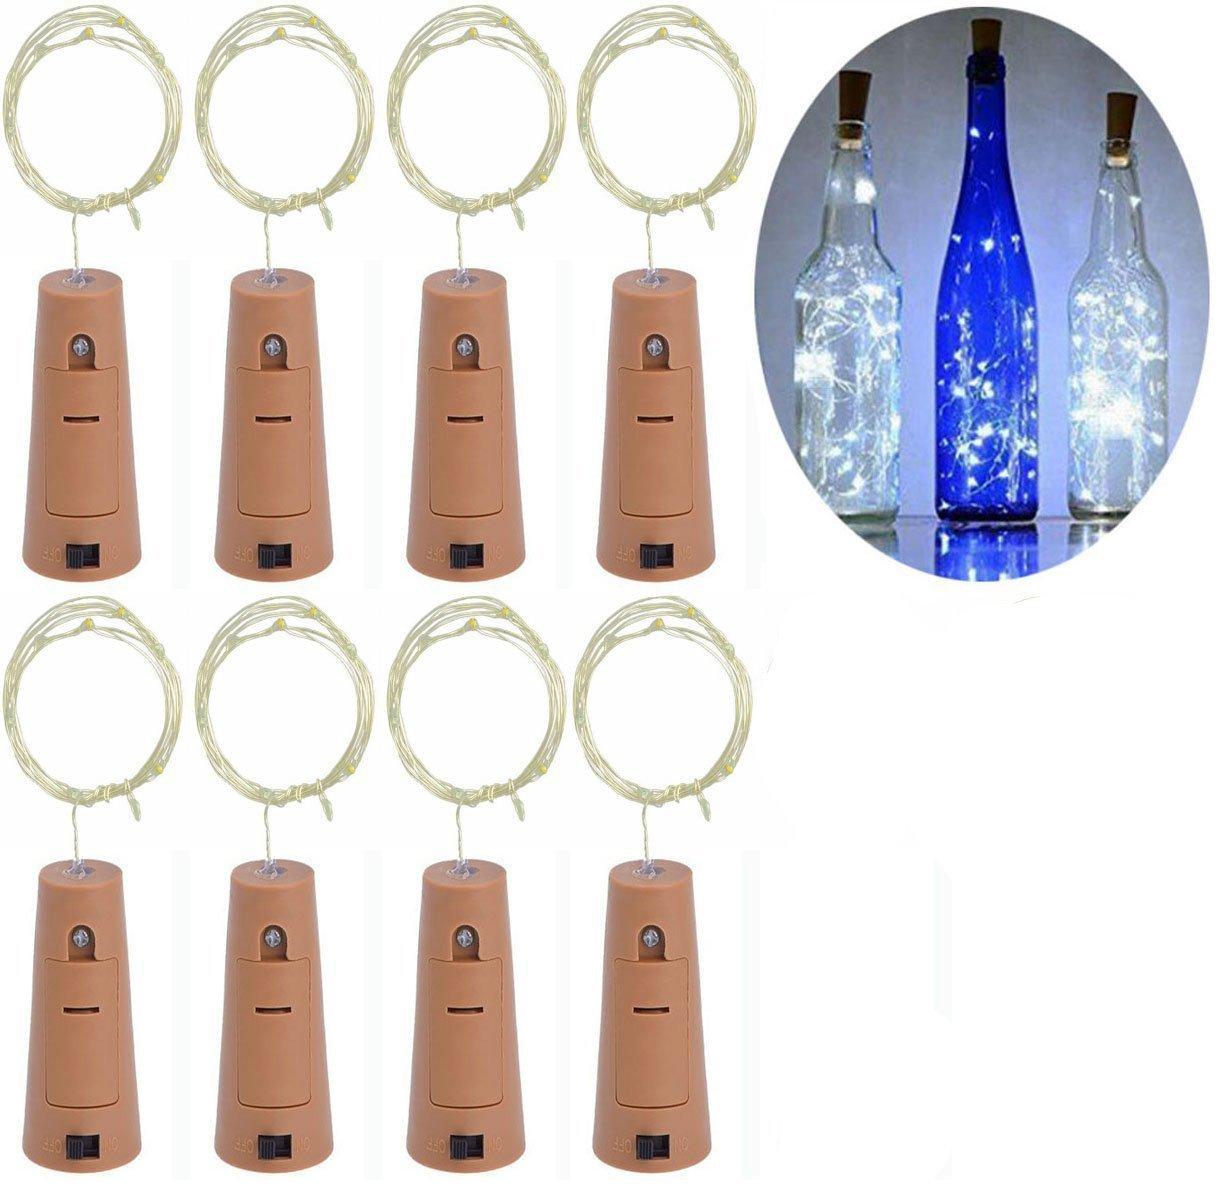 Wine Bottle String Lights, LED Cork Lights, Wine Bottle Decorations, LED Light Strip, 2 Meter / 7.2 Feet Copper Wire 20 LED Lights Battery Powered (8 packs)